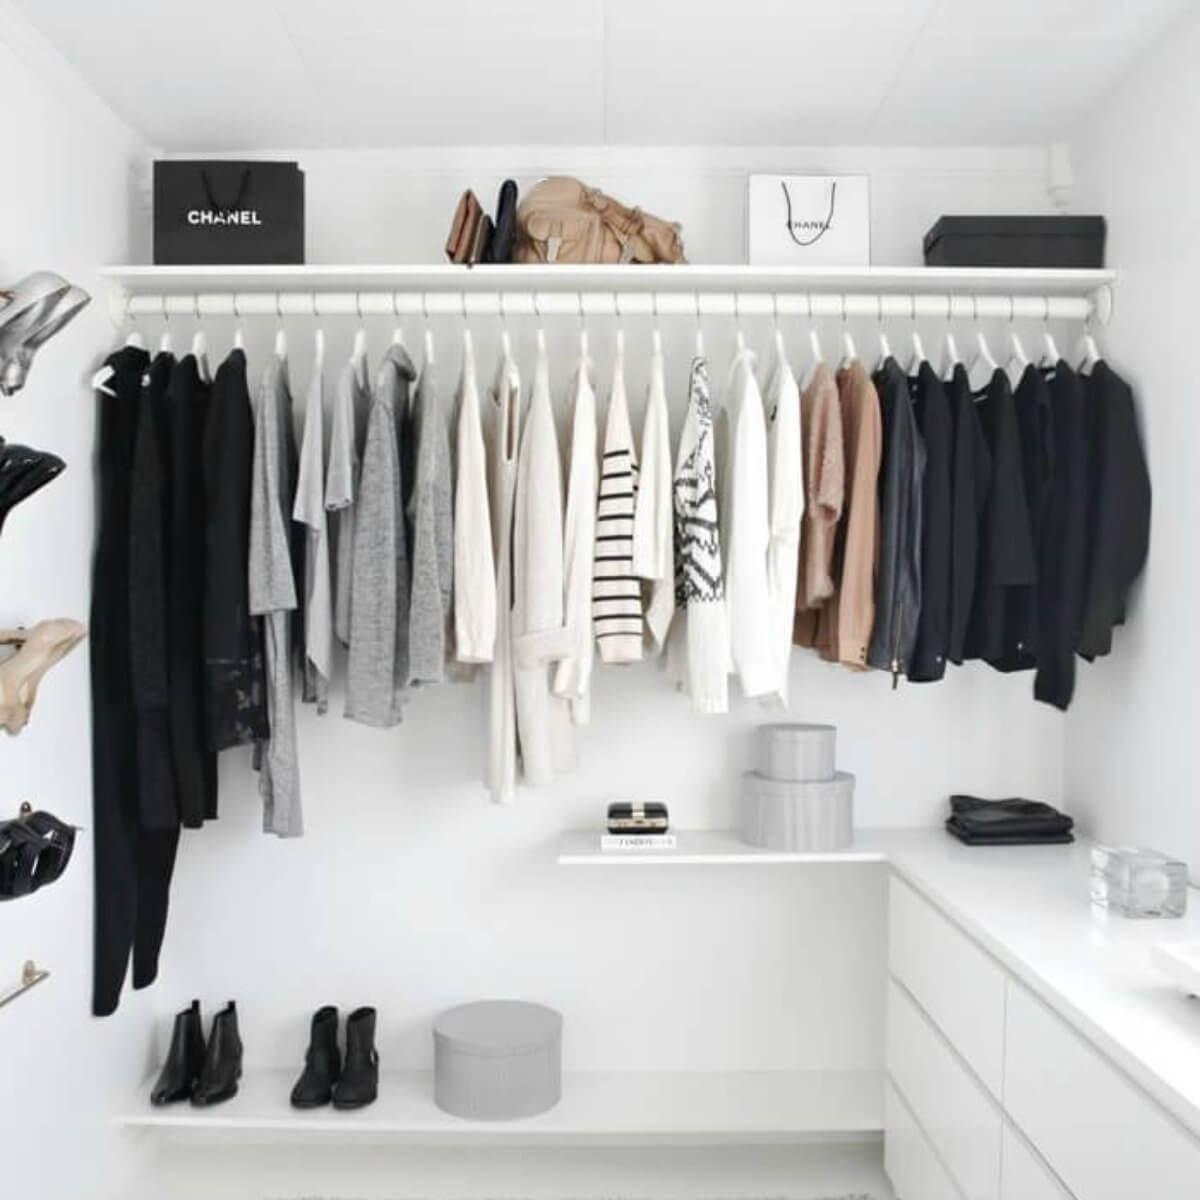 6 dicas para um guarda-roupa minimalista